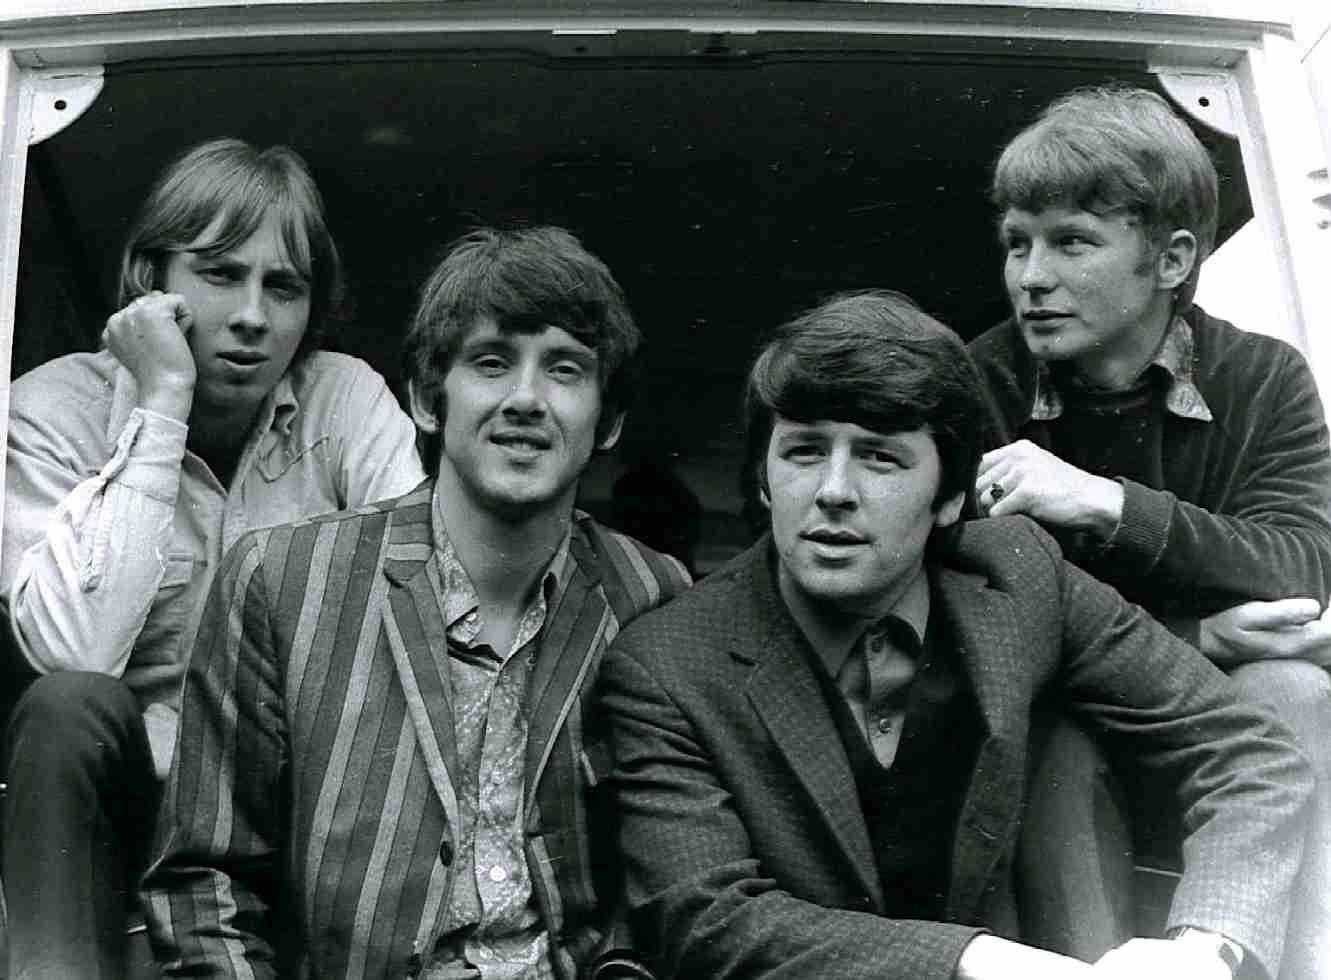 The Searchers, Stockton on Tees, England 1967